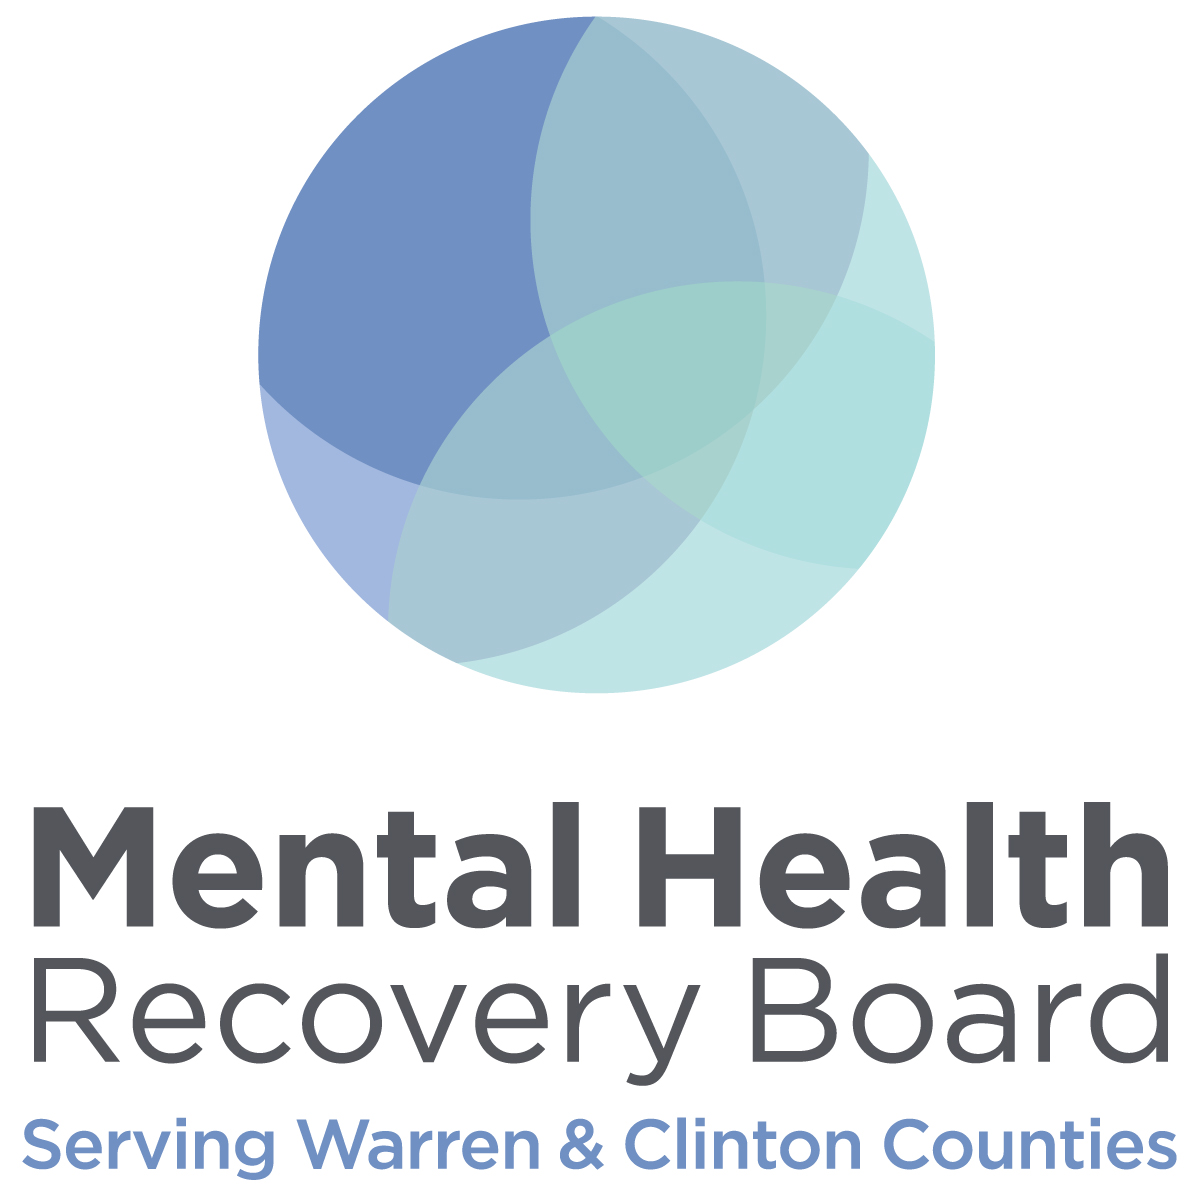 Mental Health Recovery Board Logo